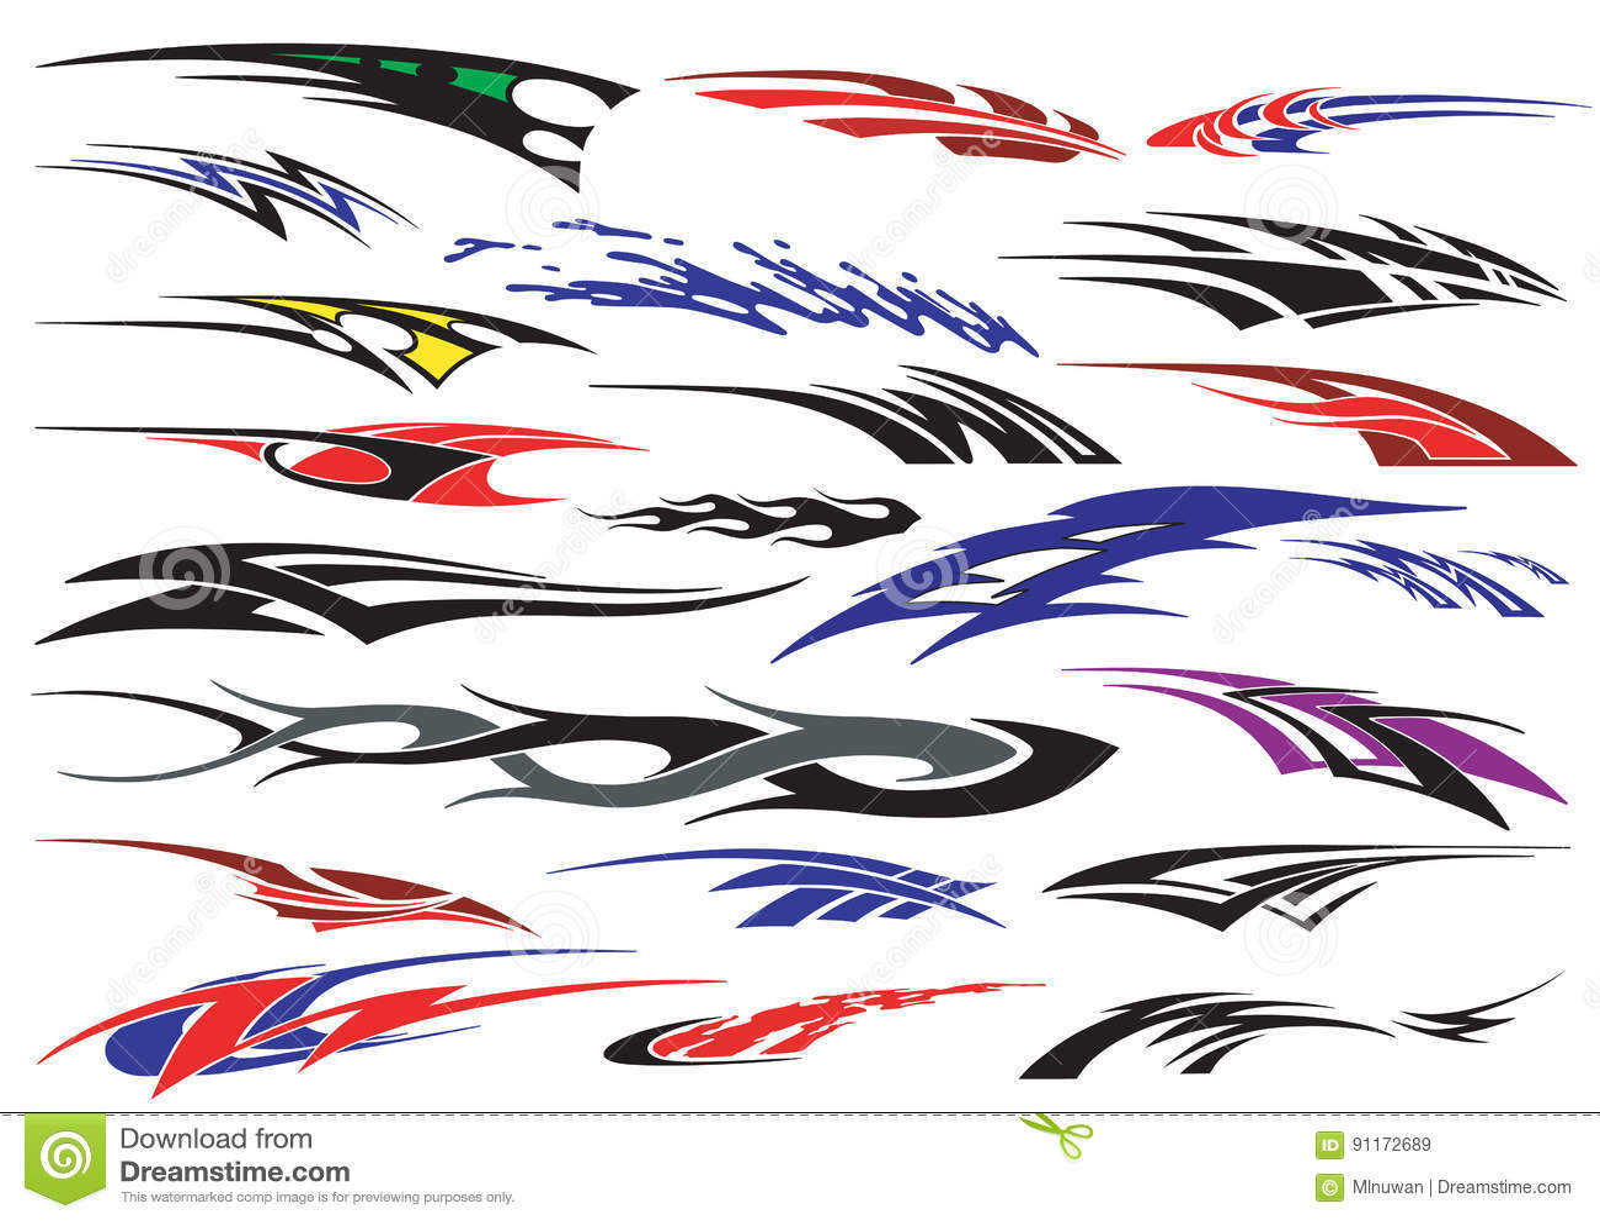 bike stickers design software - photo #44